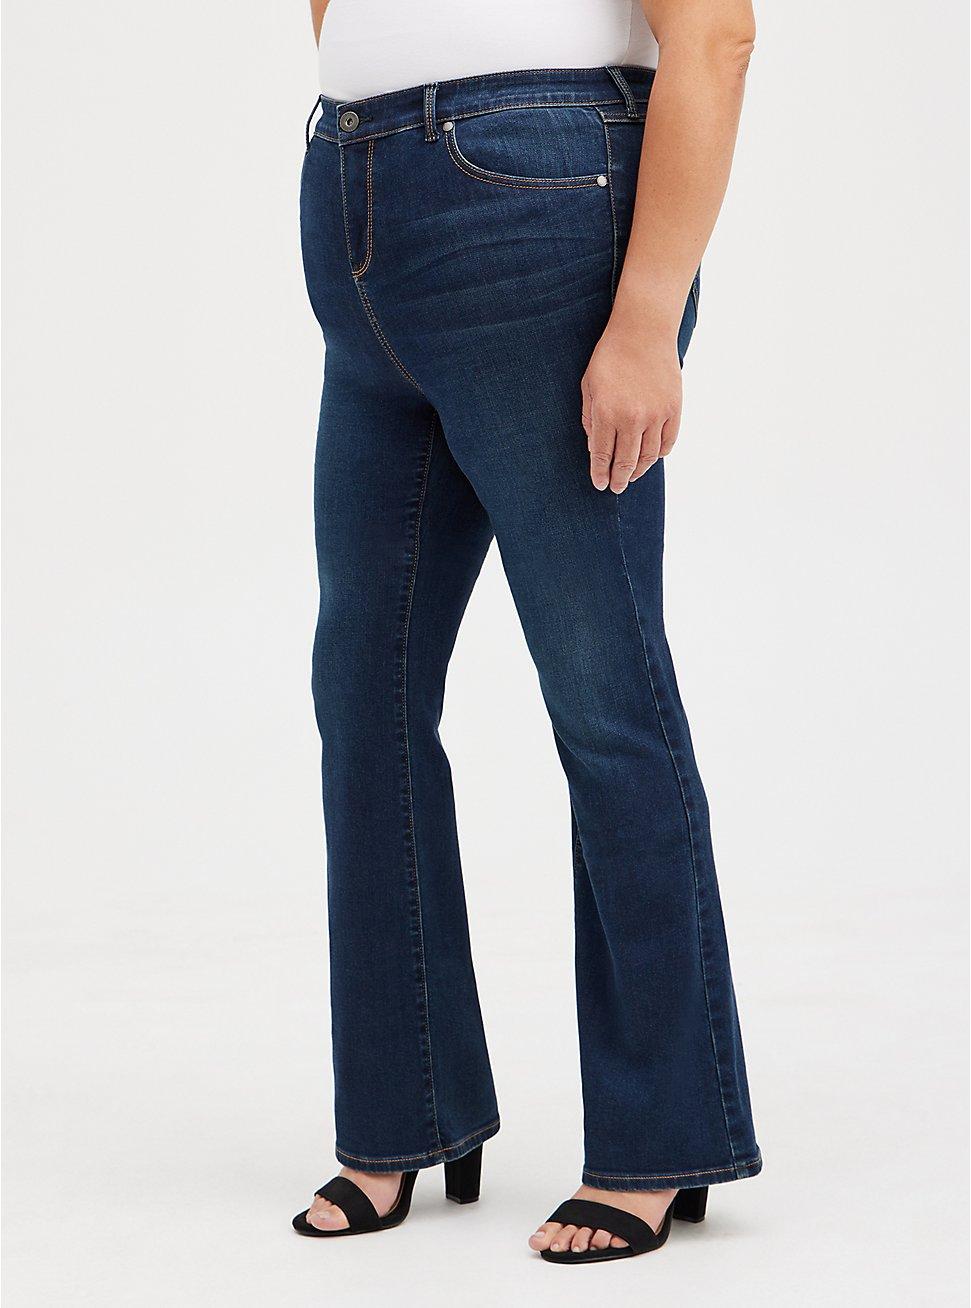 Midfit Slim Boot Jean - Super Soft Dark Wash, BASIN, hi-res